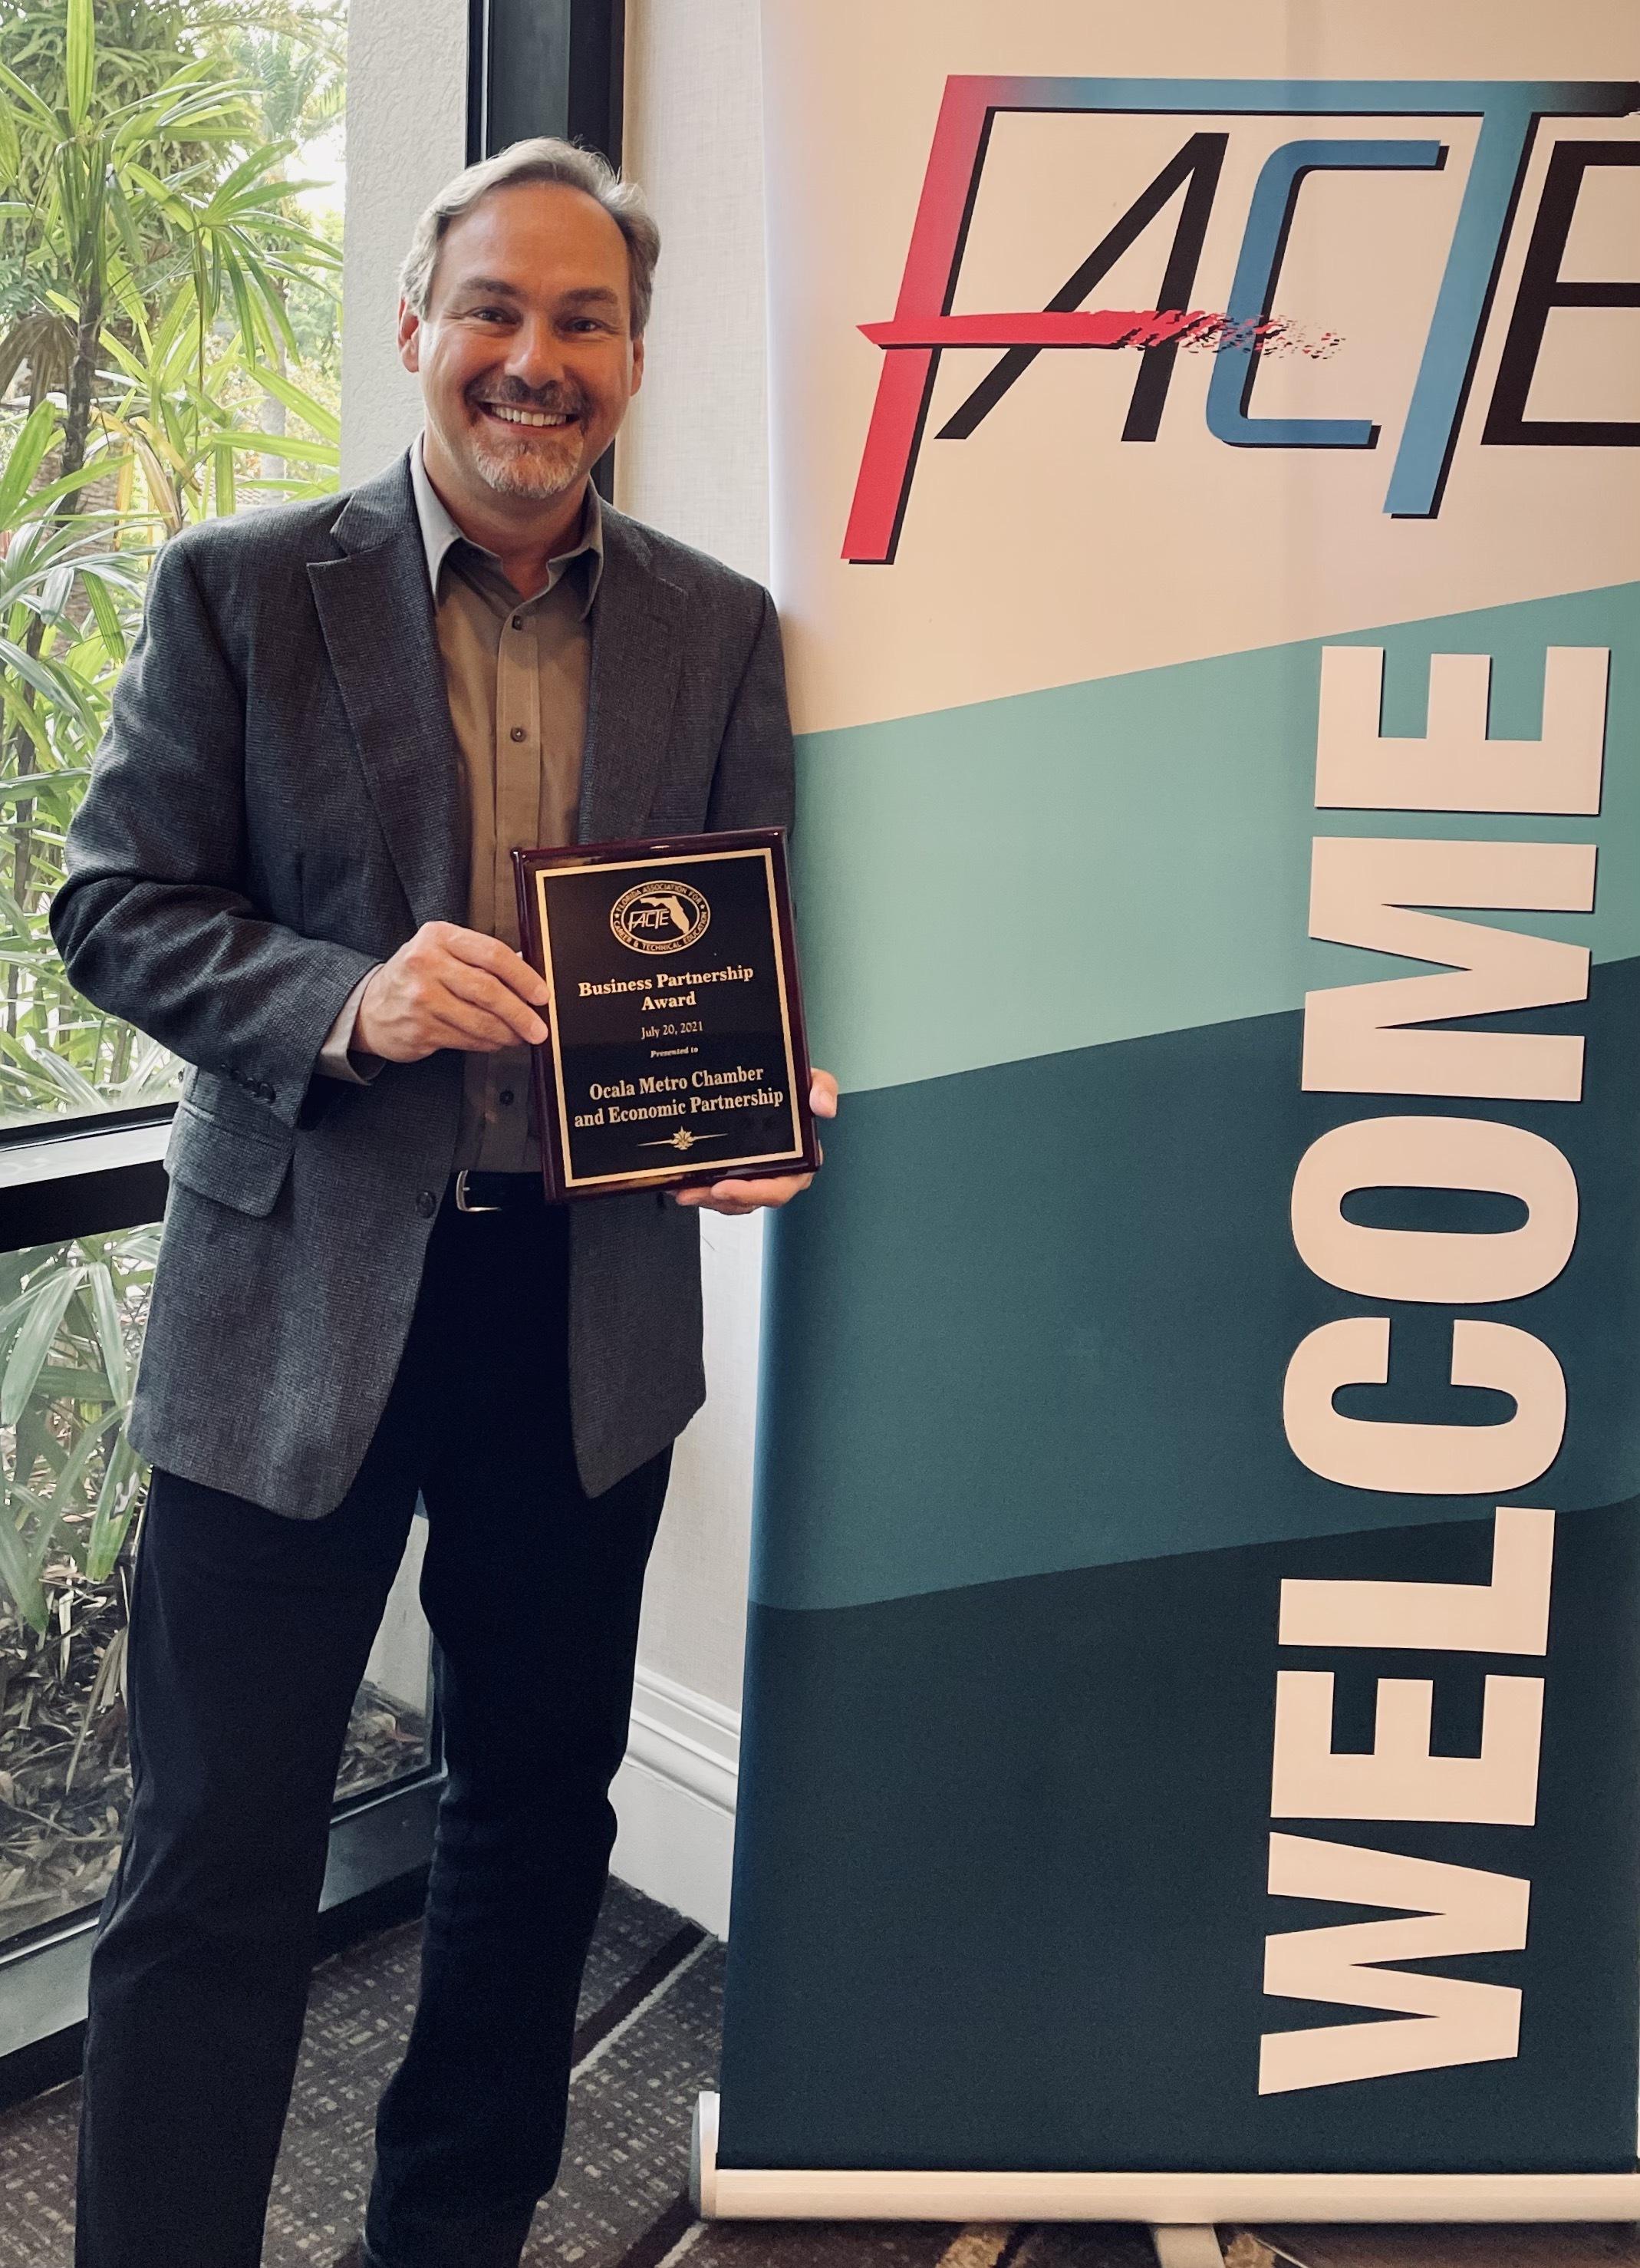 CEP's Blinkhorn Receives Statewide Award